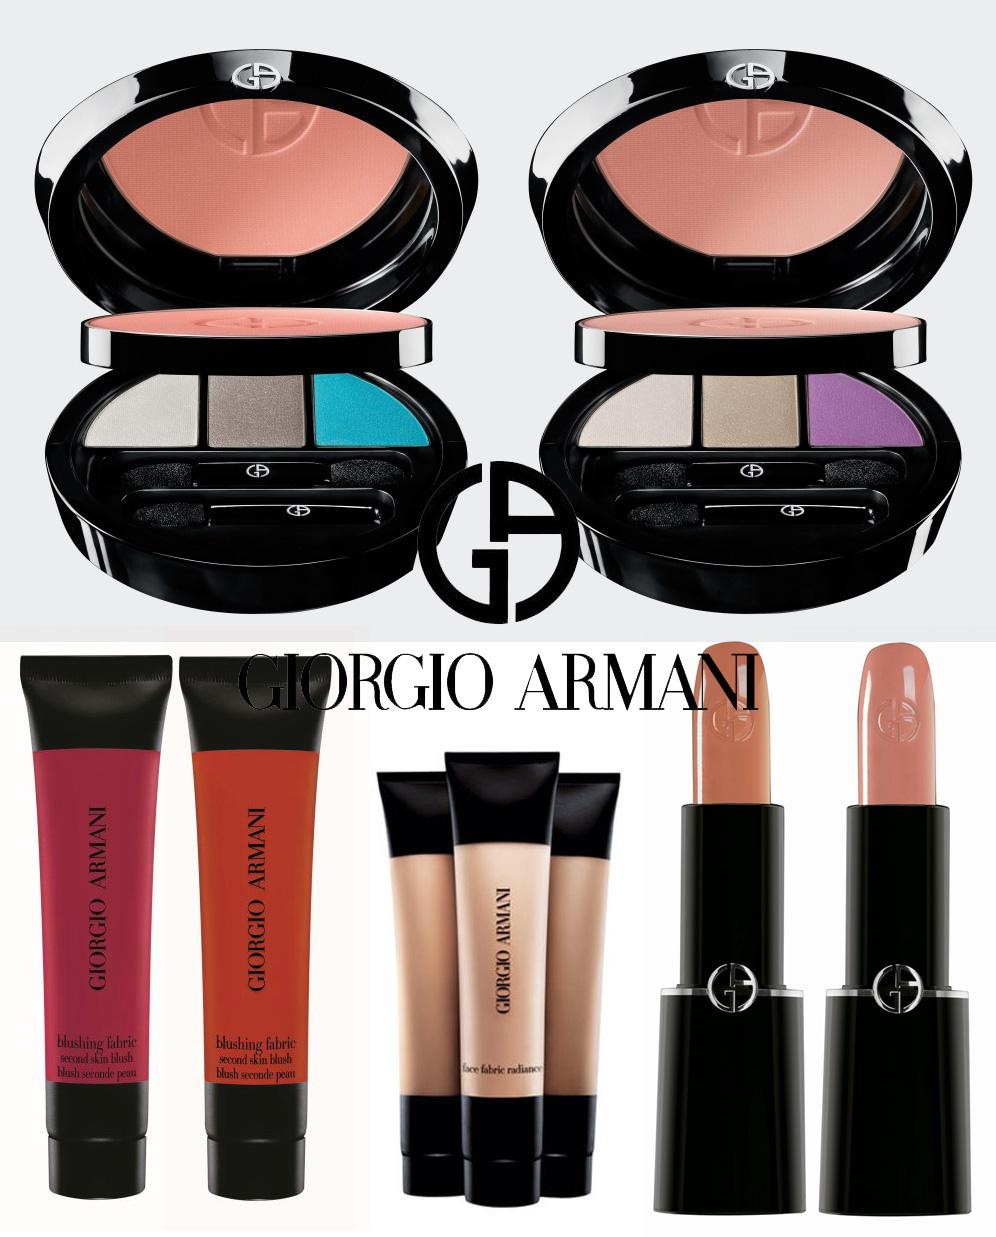 Giorgio Armani | Tommy Beauty Pro